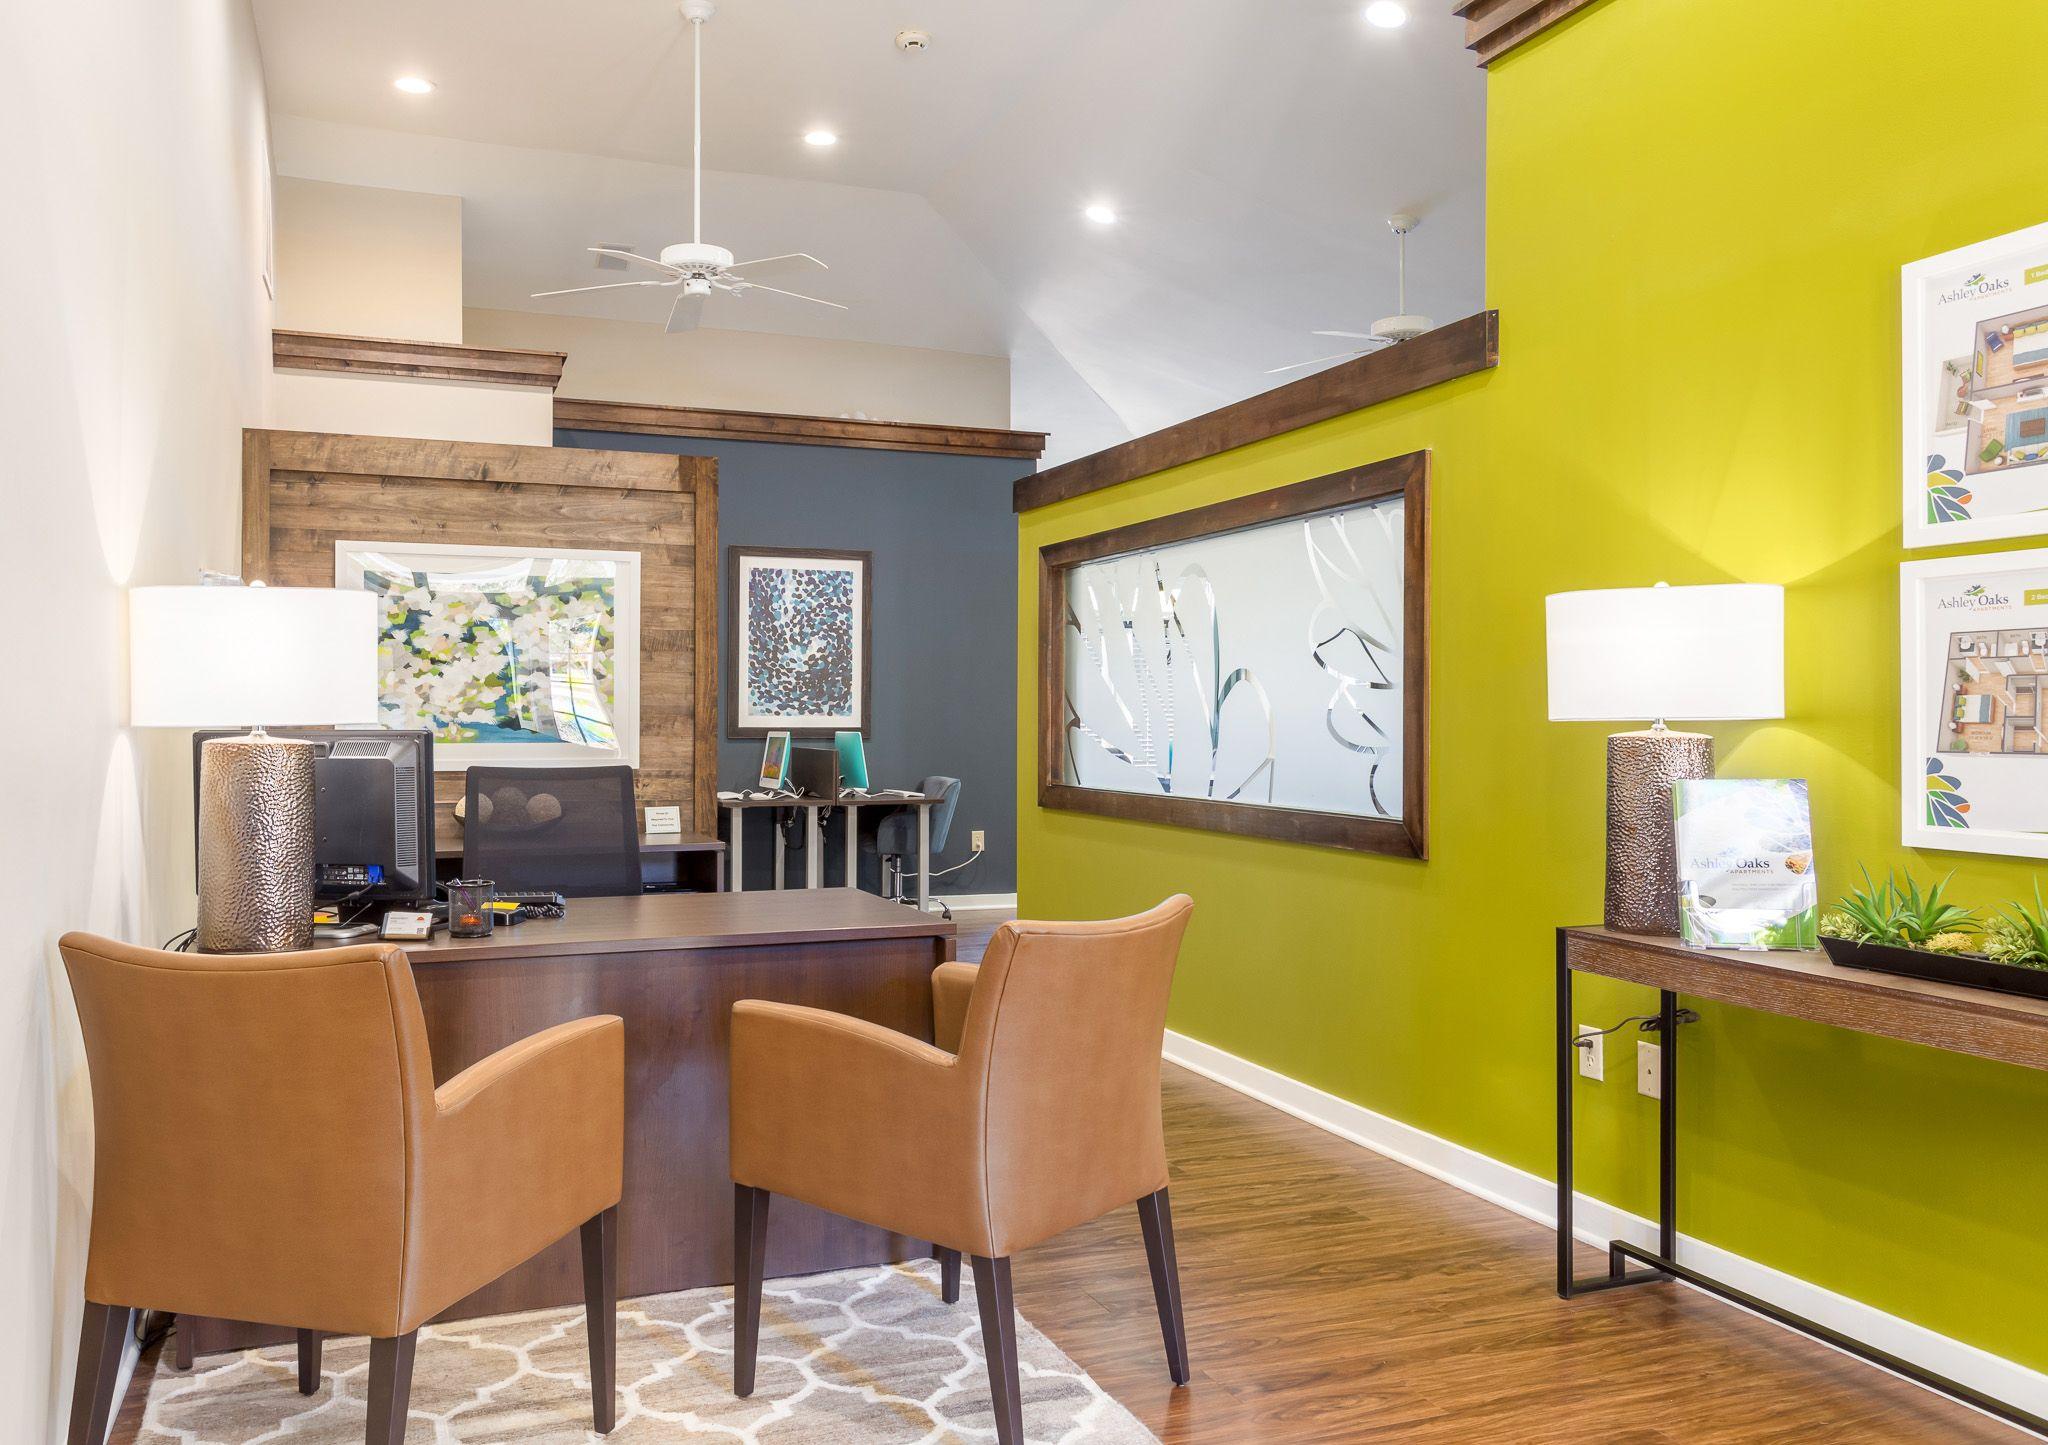 Ashley Oaks Apartments Apartment communities, Home decor